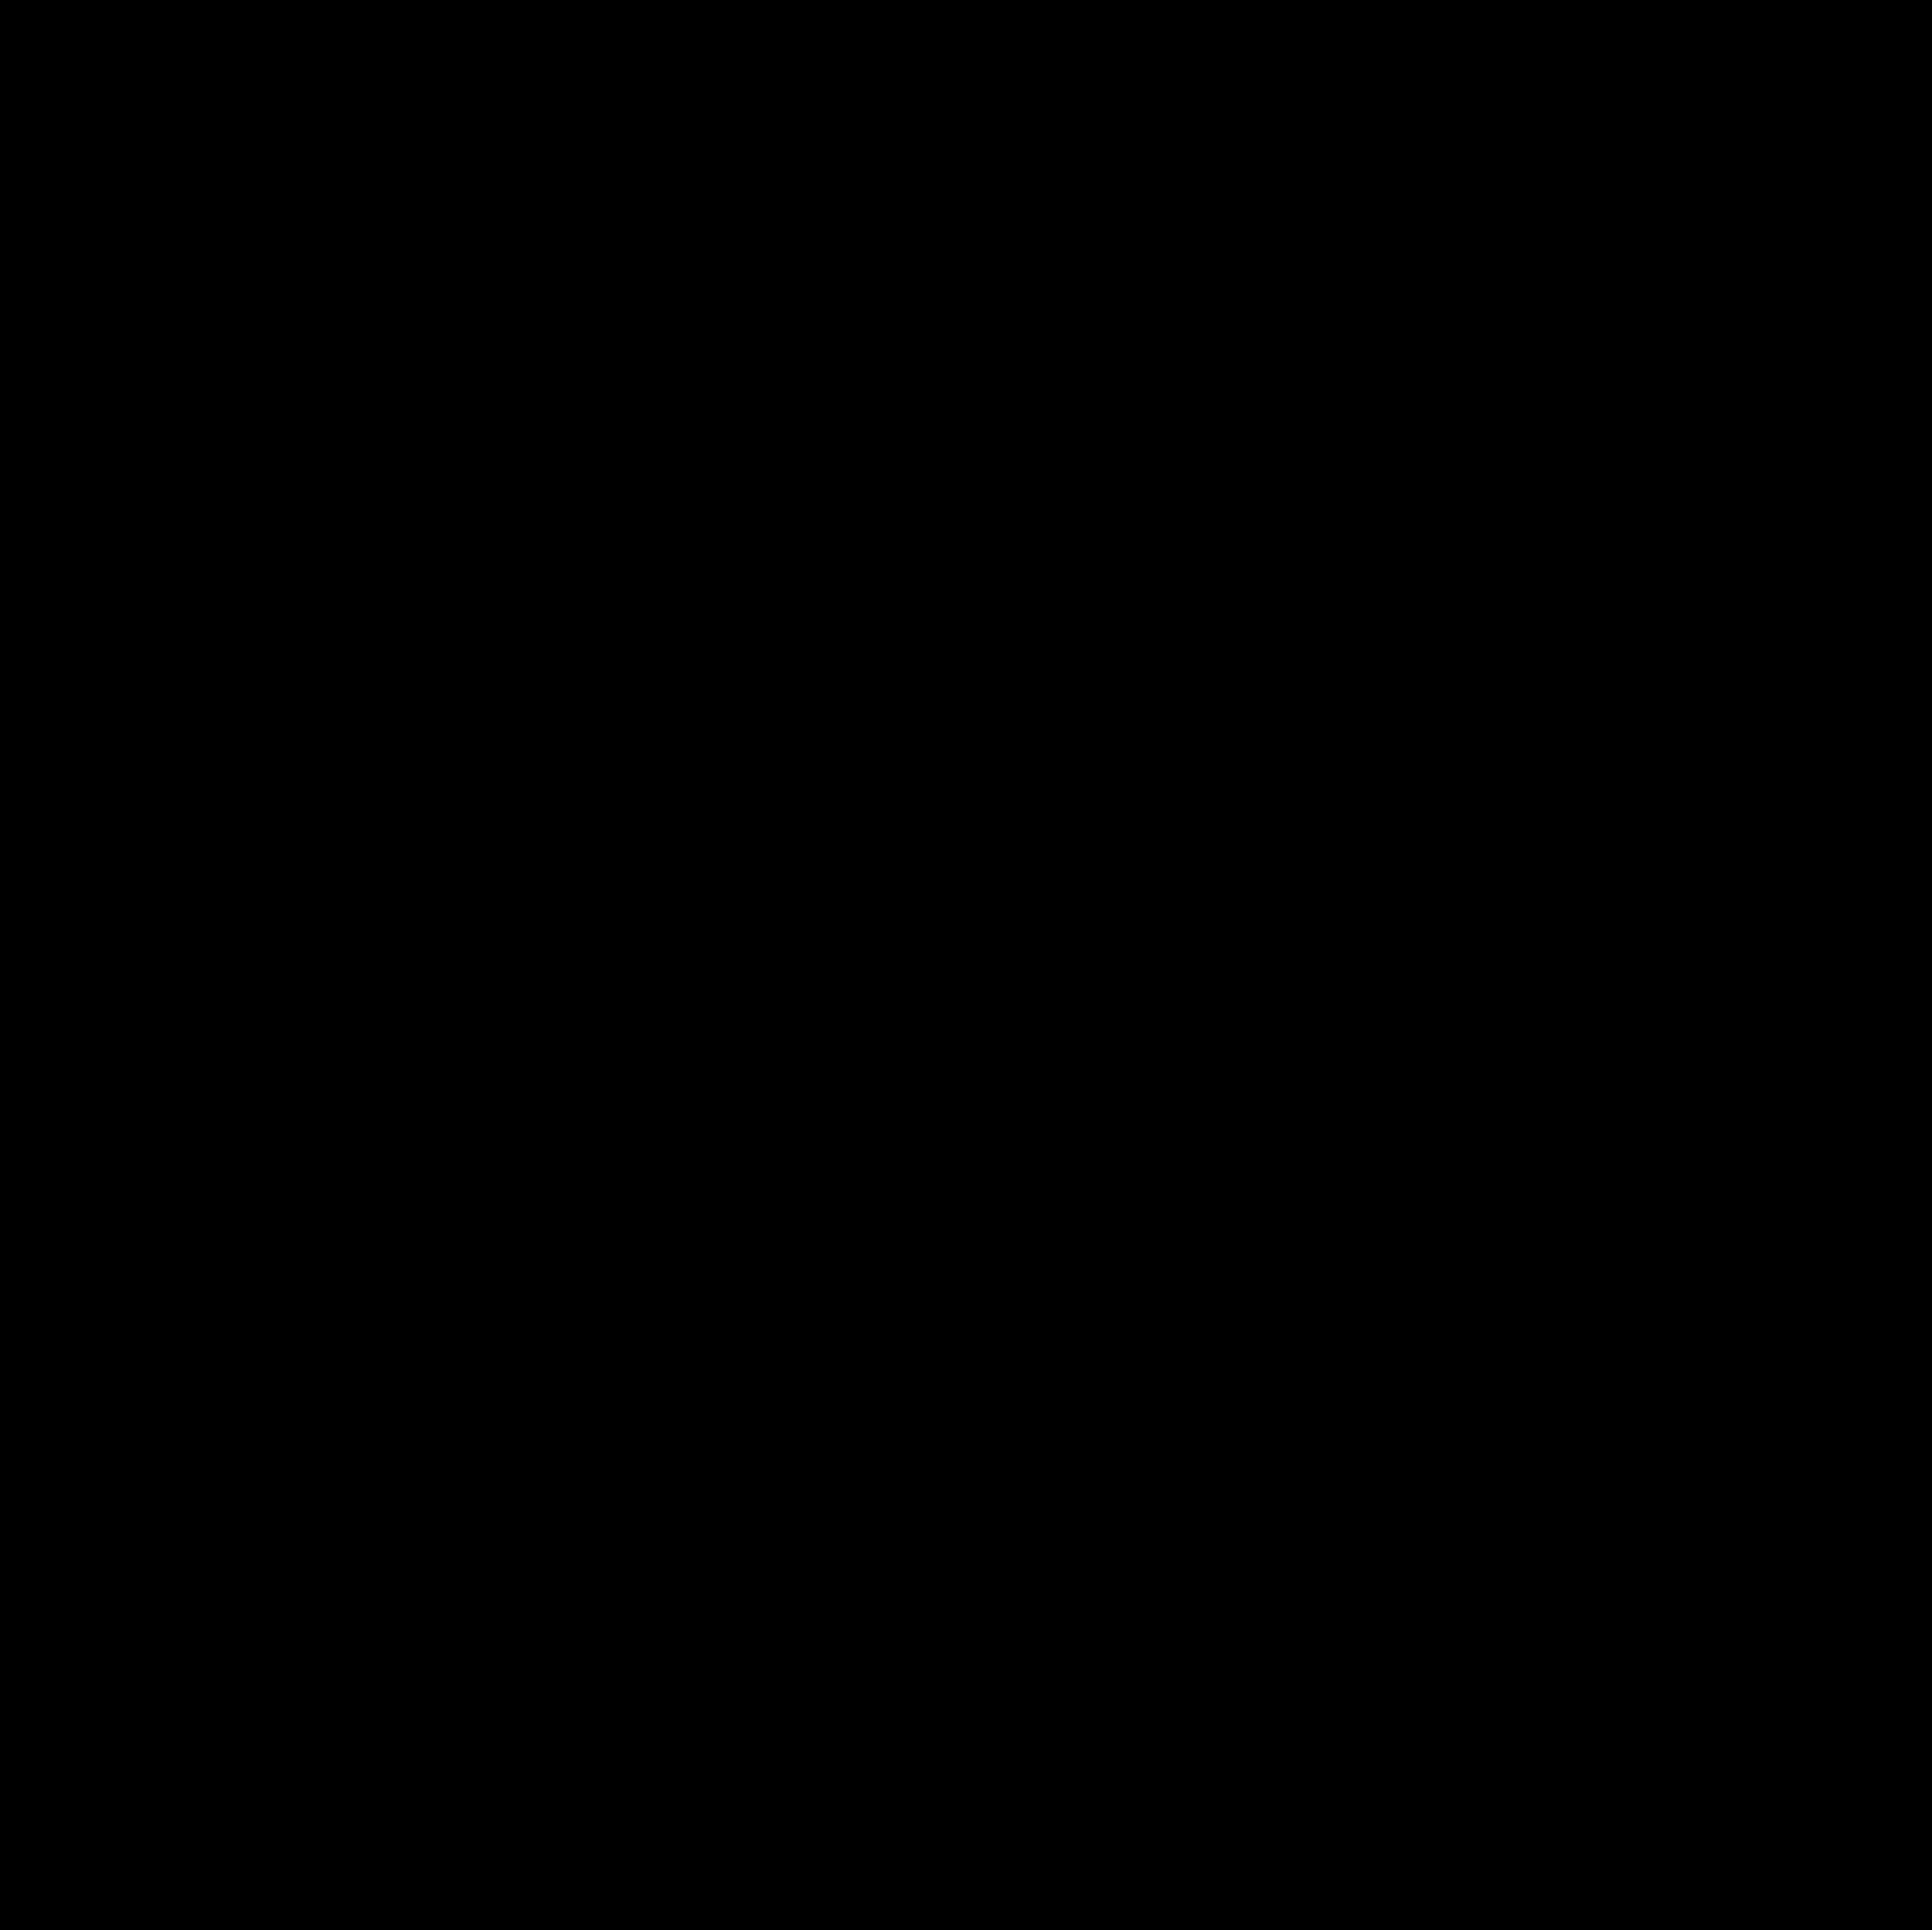 graphic transparent library Dark vortex big image. Sunburst clipart black and white